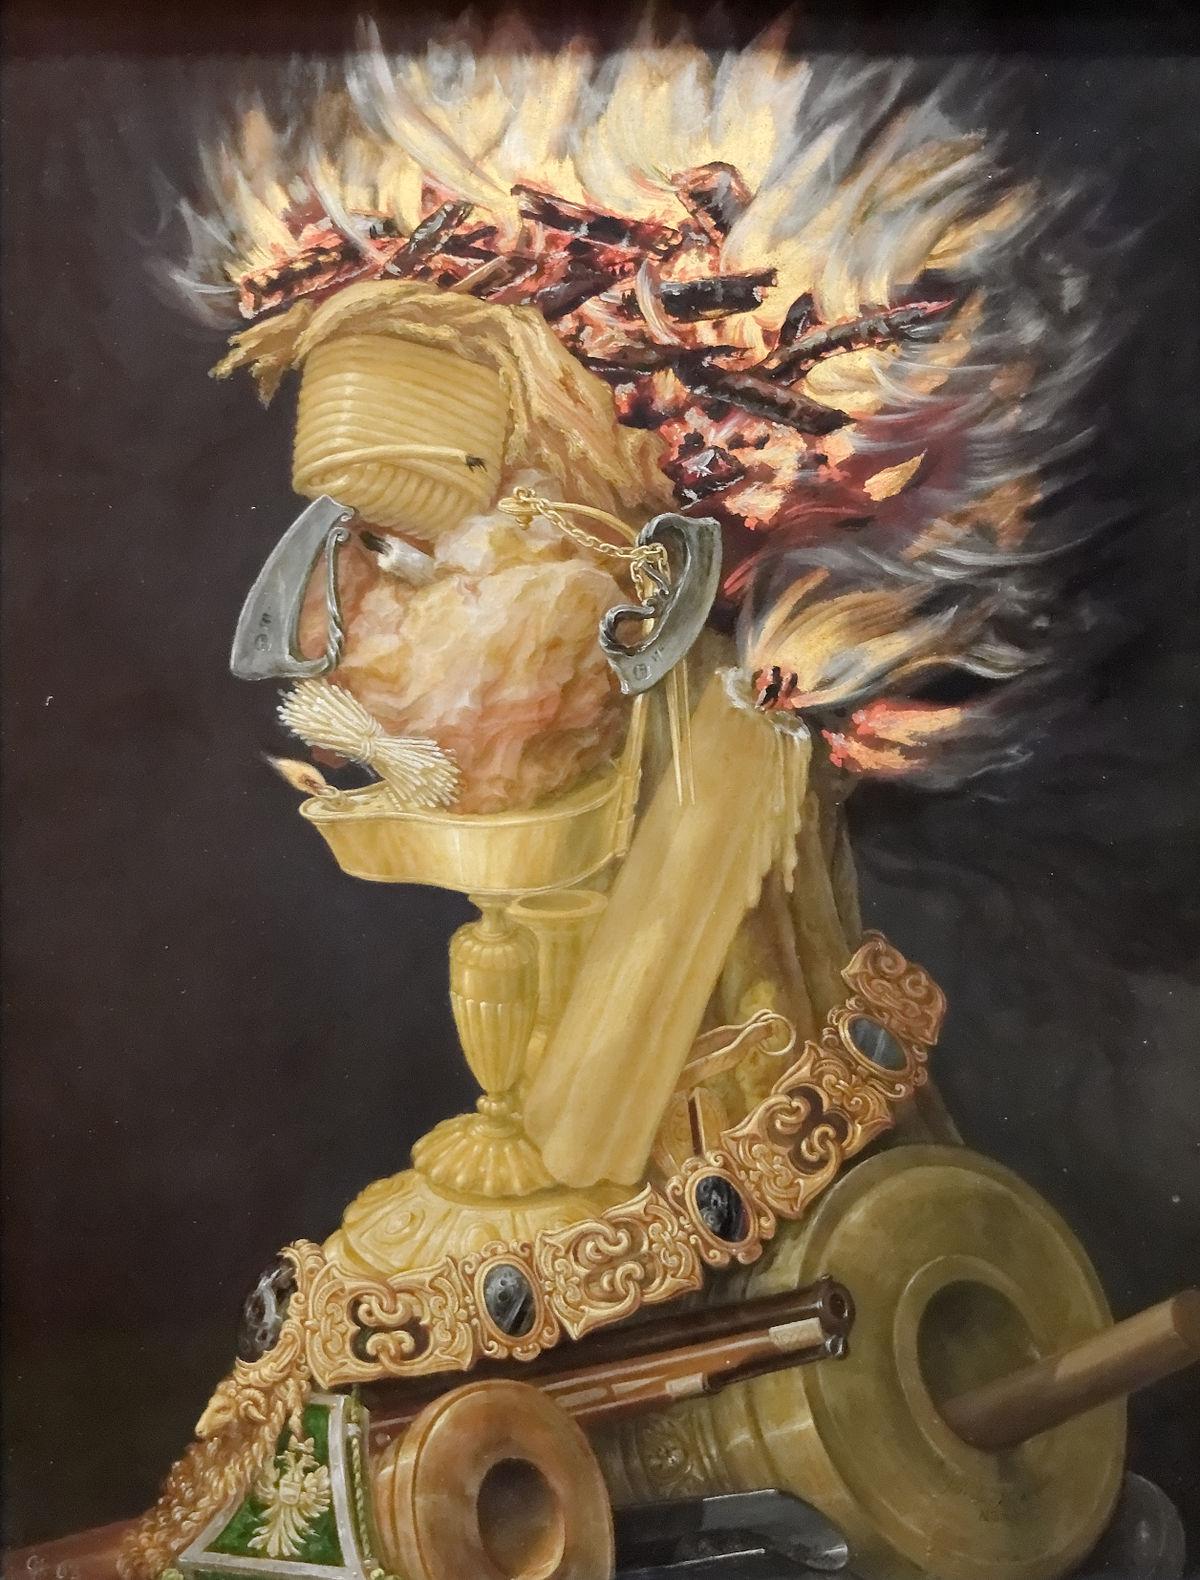 Giuseppe Arcimboldo Fire Kunsthistorisches Museum.jpg